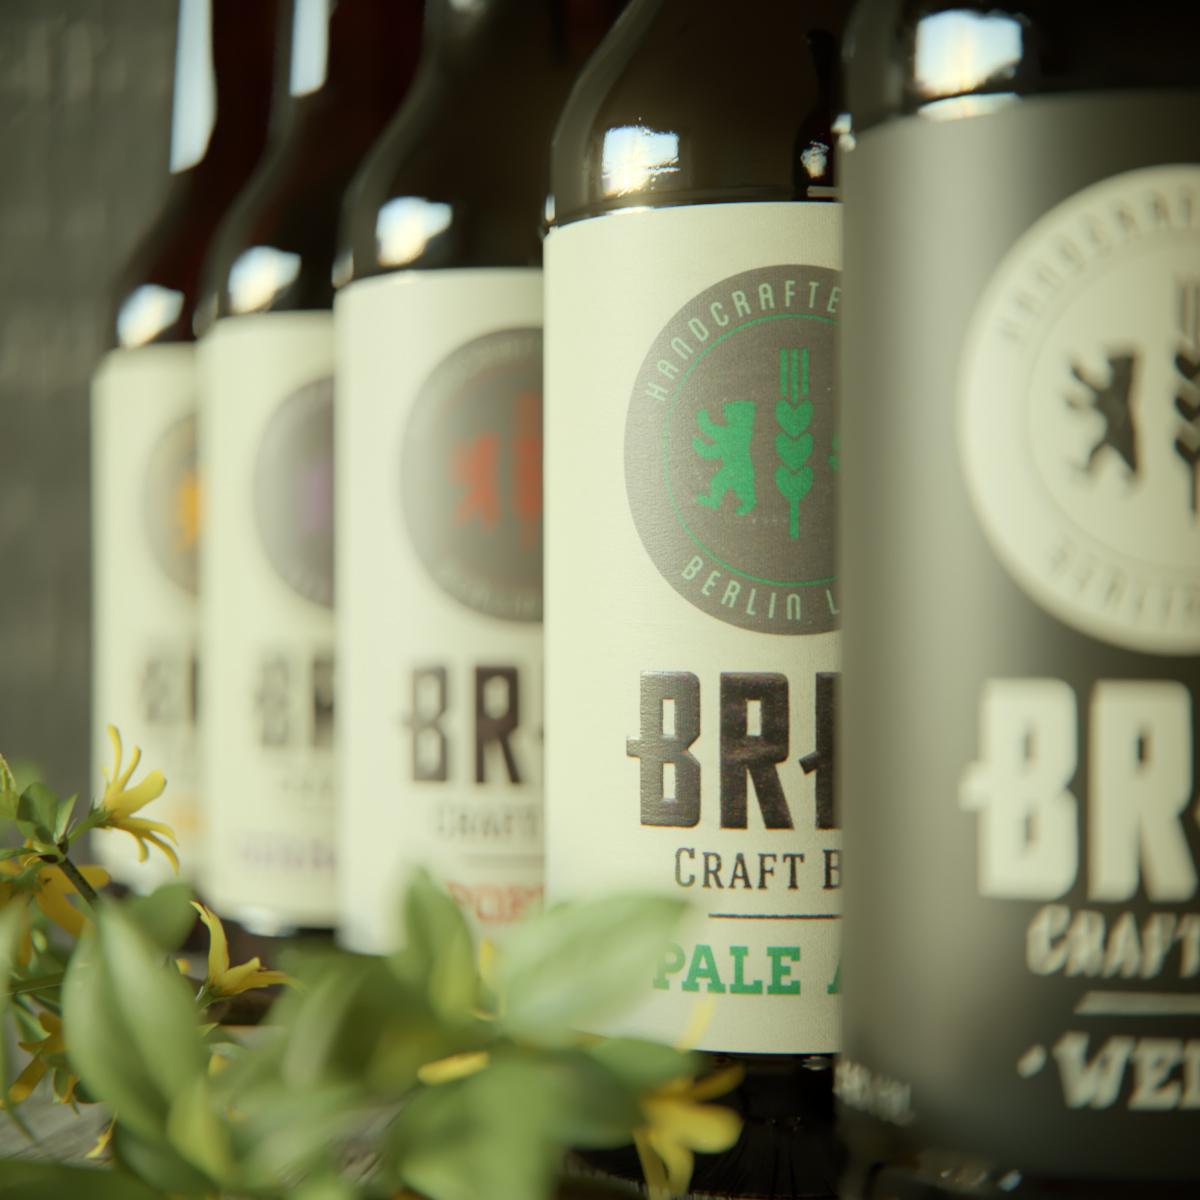 BRLO beer CGI